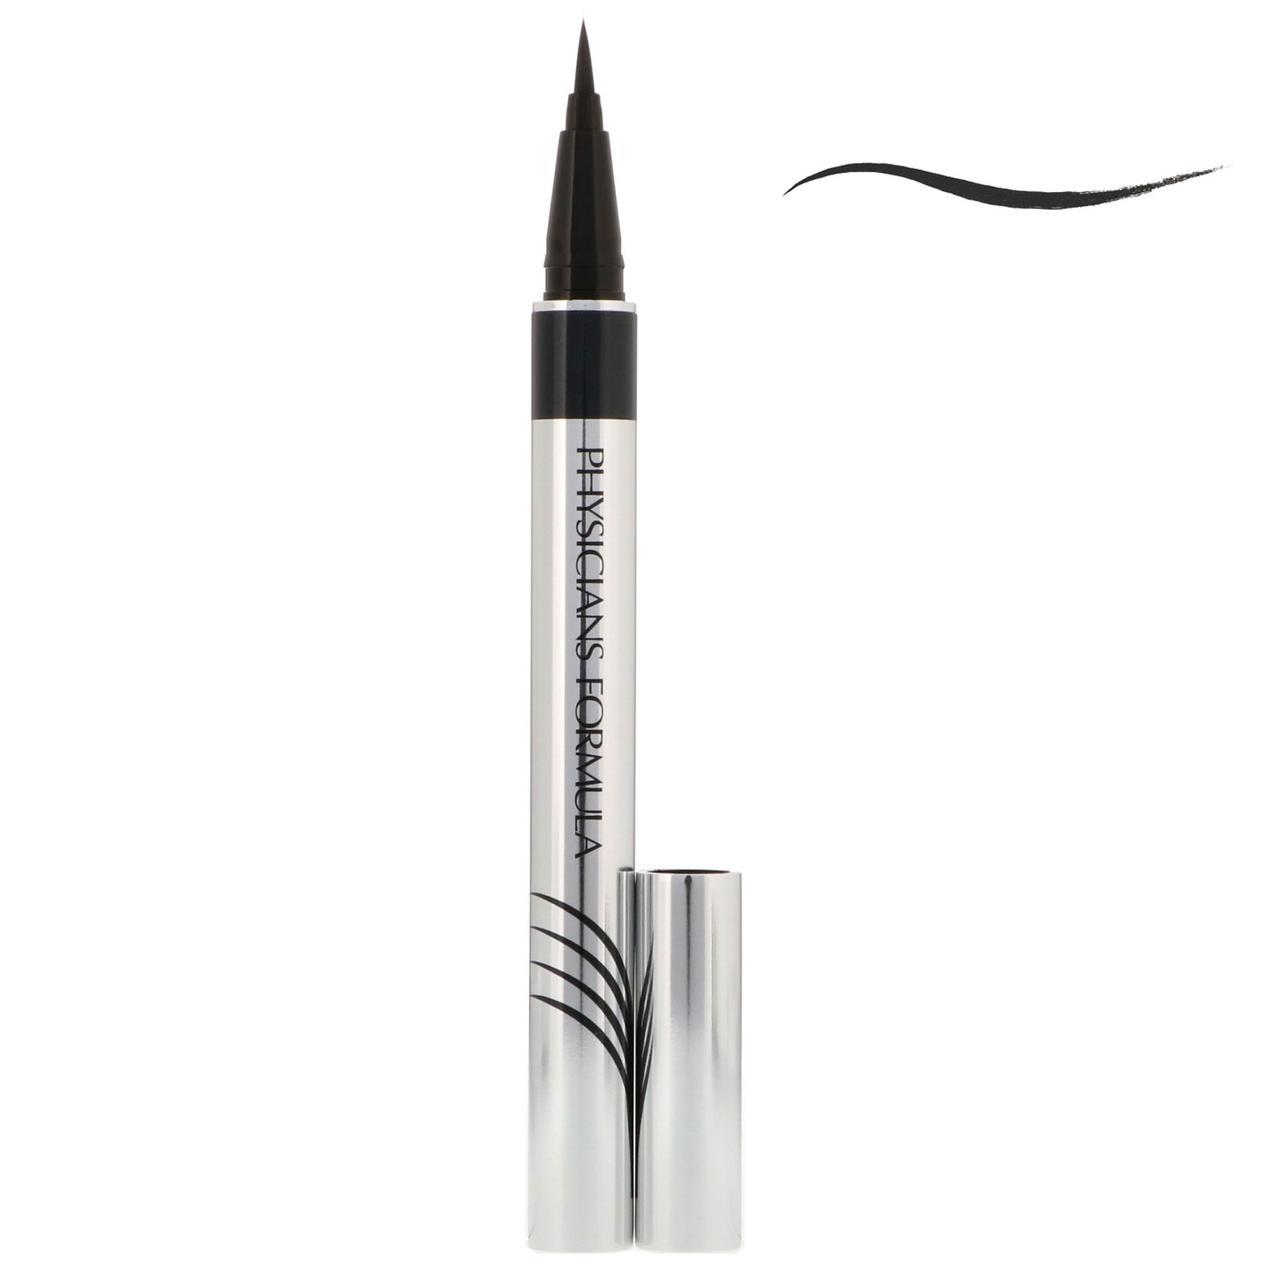 Подводка - сыворотка Physicians Formula Eye Booster 2-in-1 Lash Boosting Eyeliner + Serum Черная